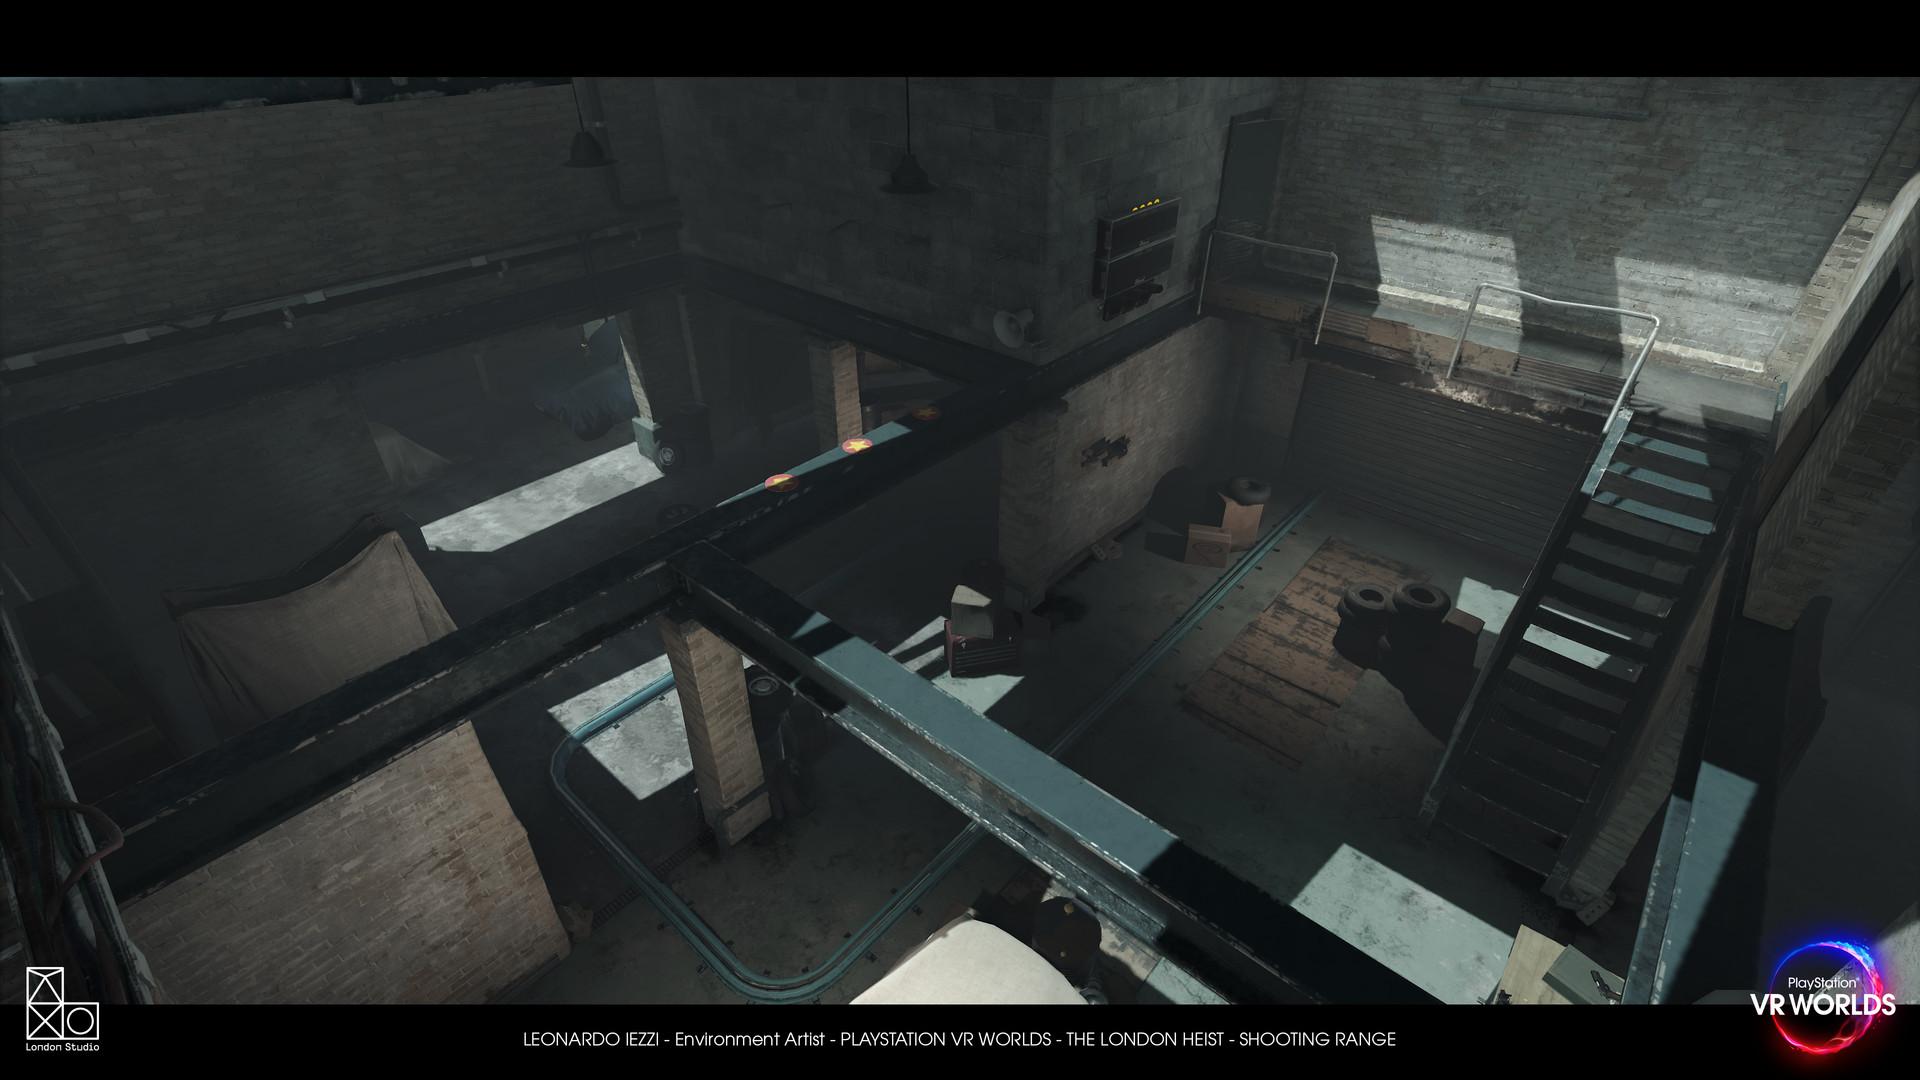 Leonardo iezzi leonardo iezzi environment artist vr worlds shooting range 03